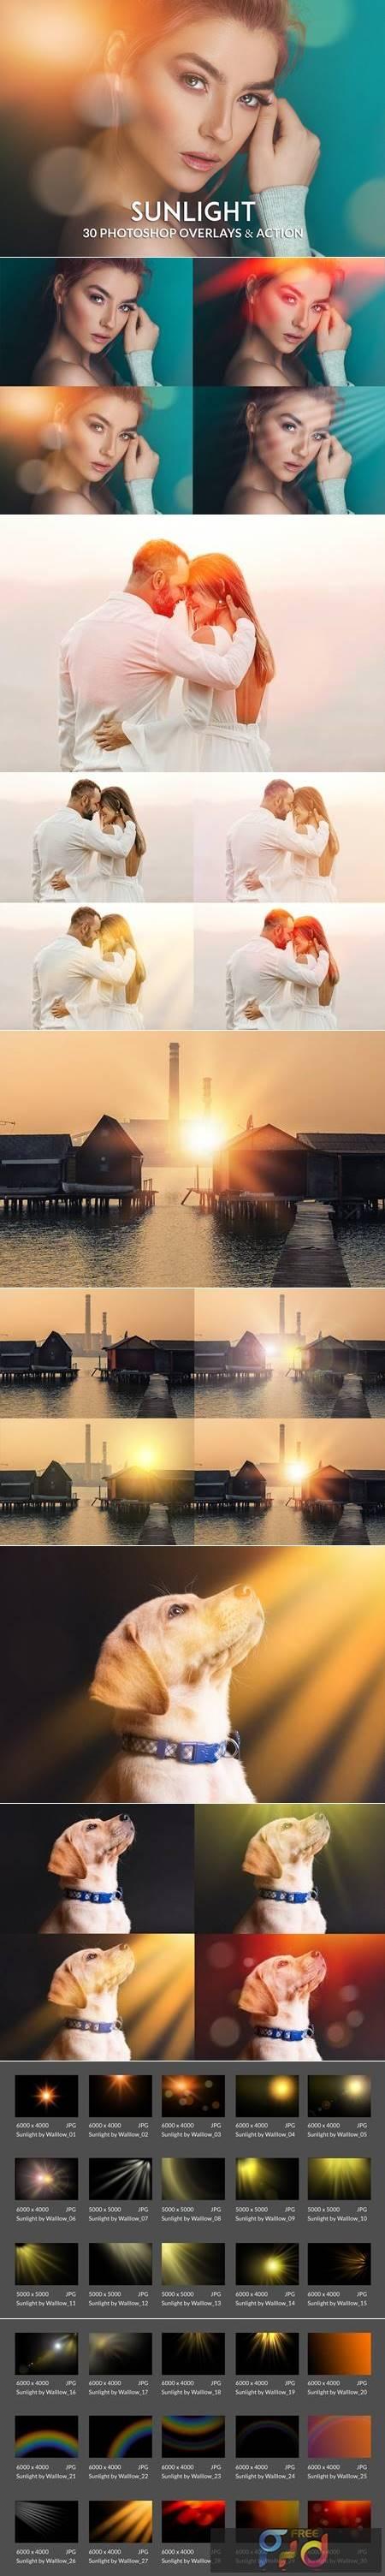 Realistic Sunlight Overlay Photoshop Action RTCFYJF 1